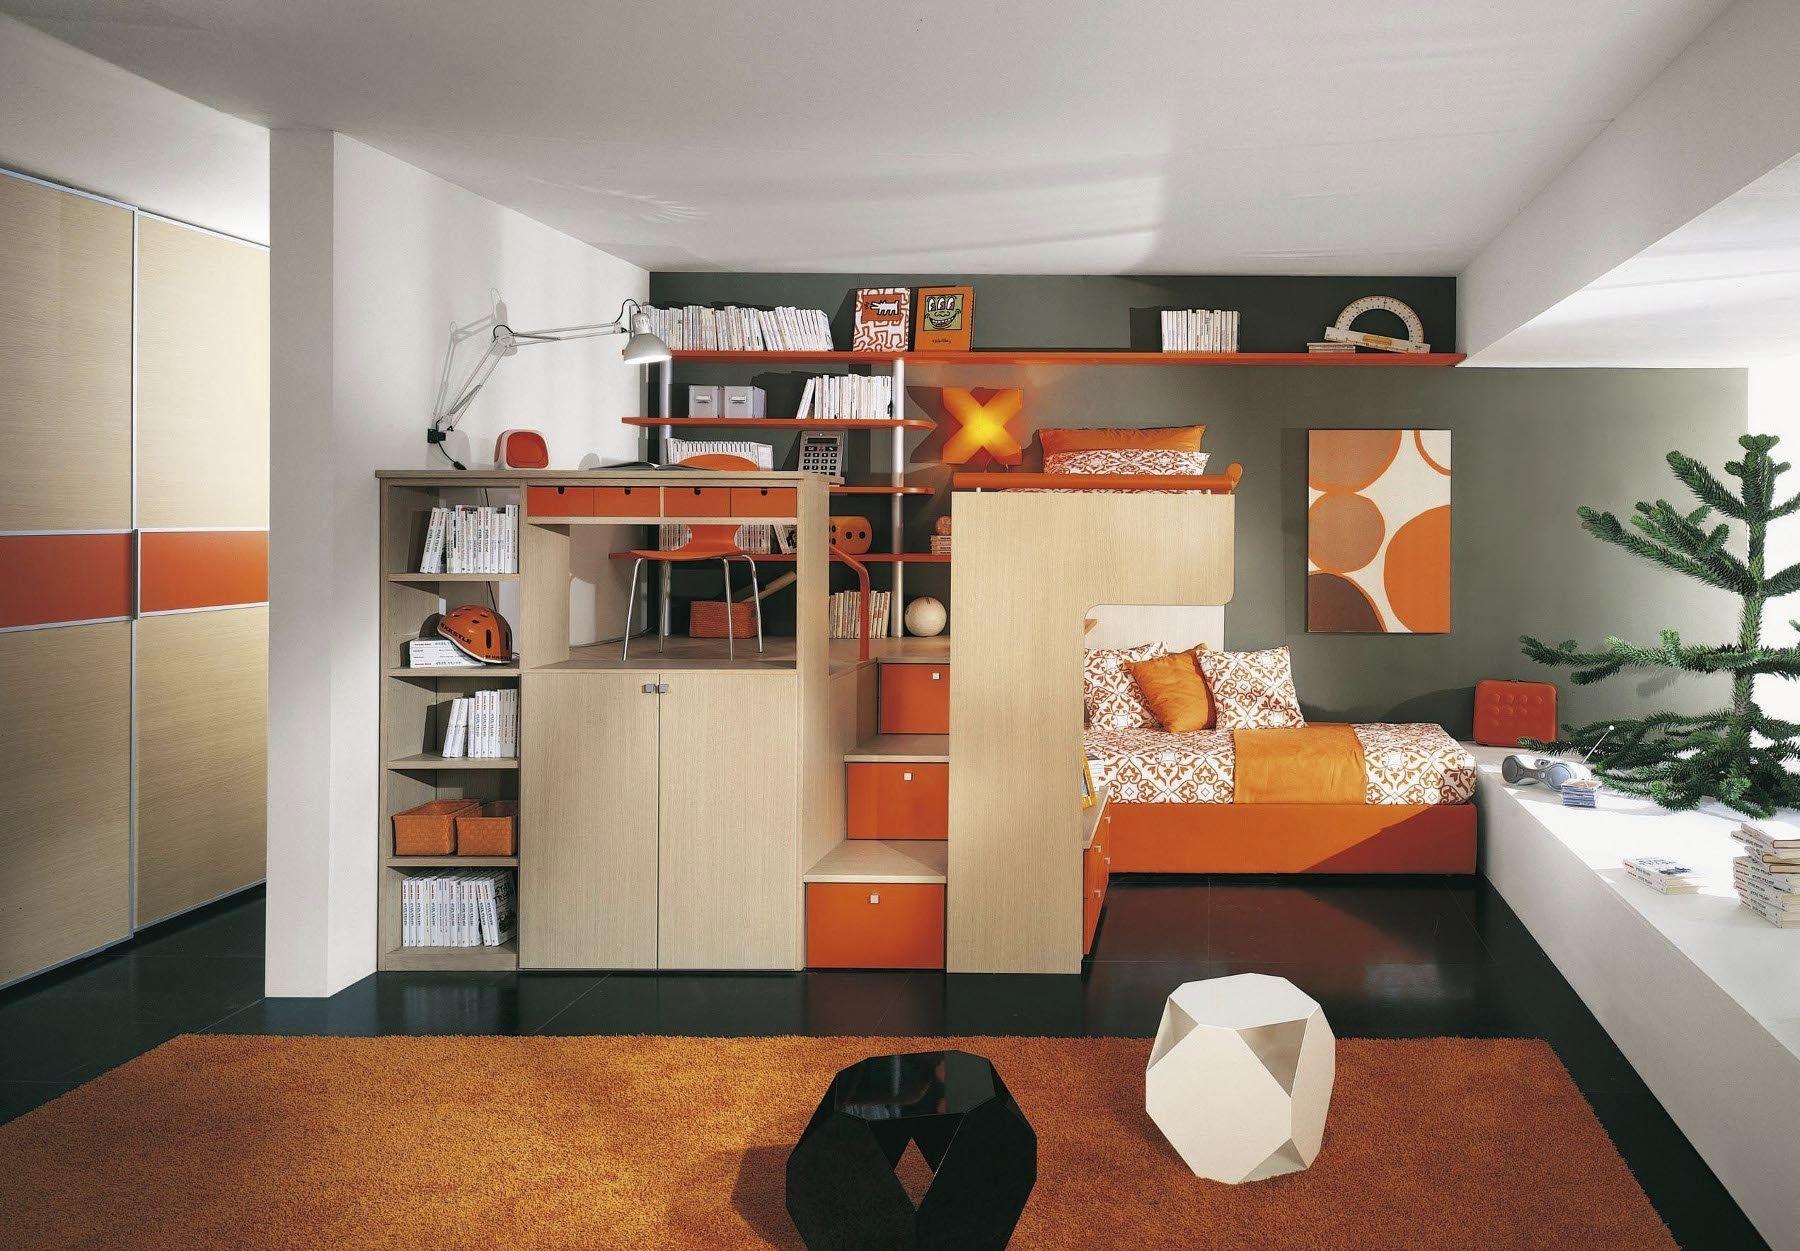 Modular Furniture For Small Room Homesfeed